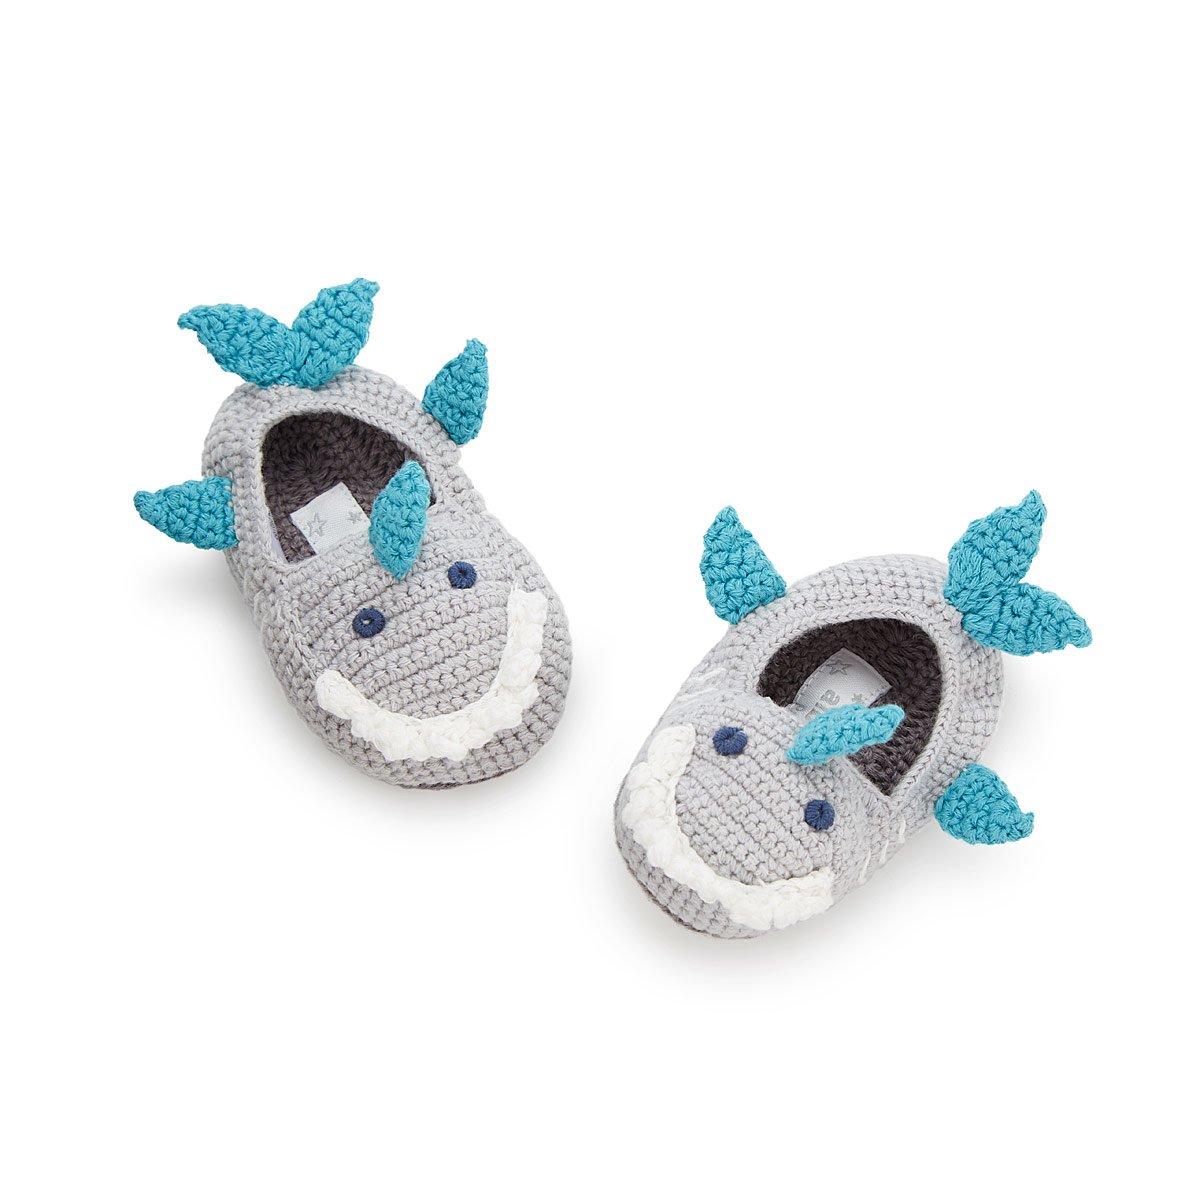 Shark Booties Baby Booties Baby Shoes Uncommongoods